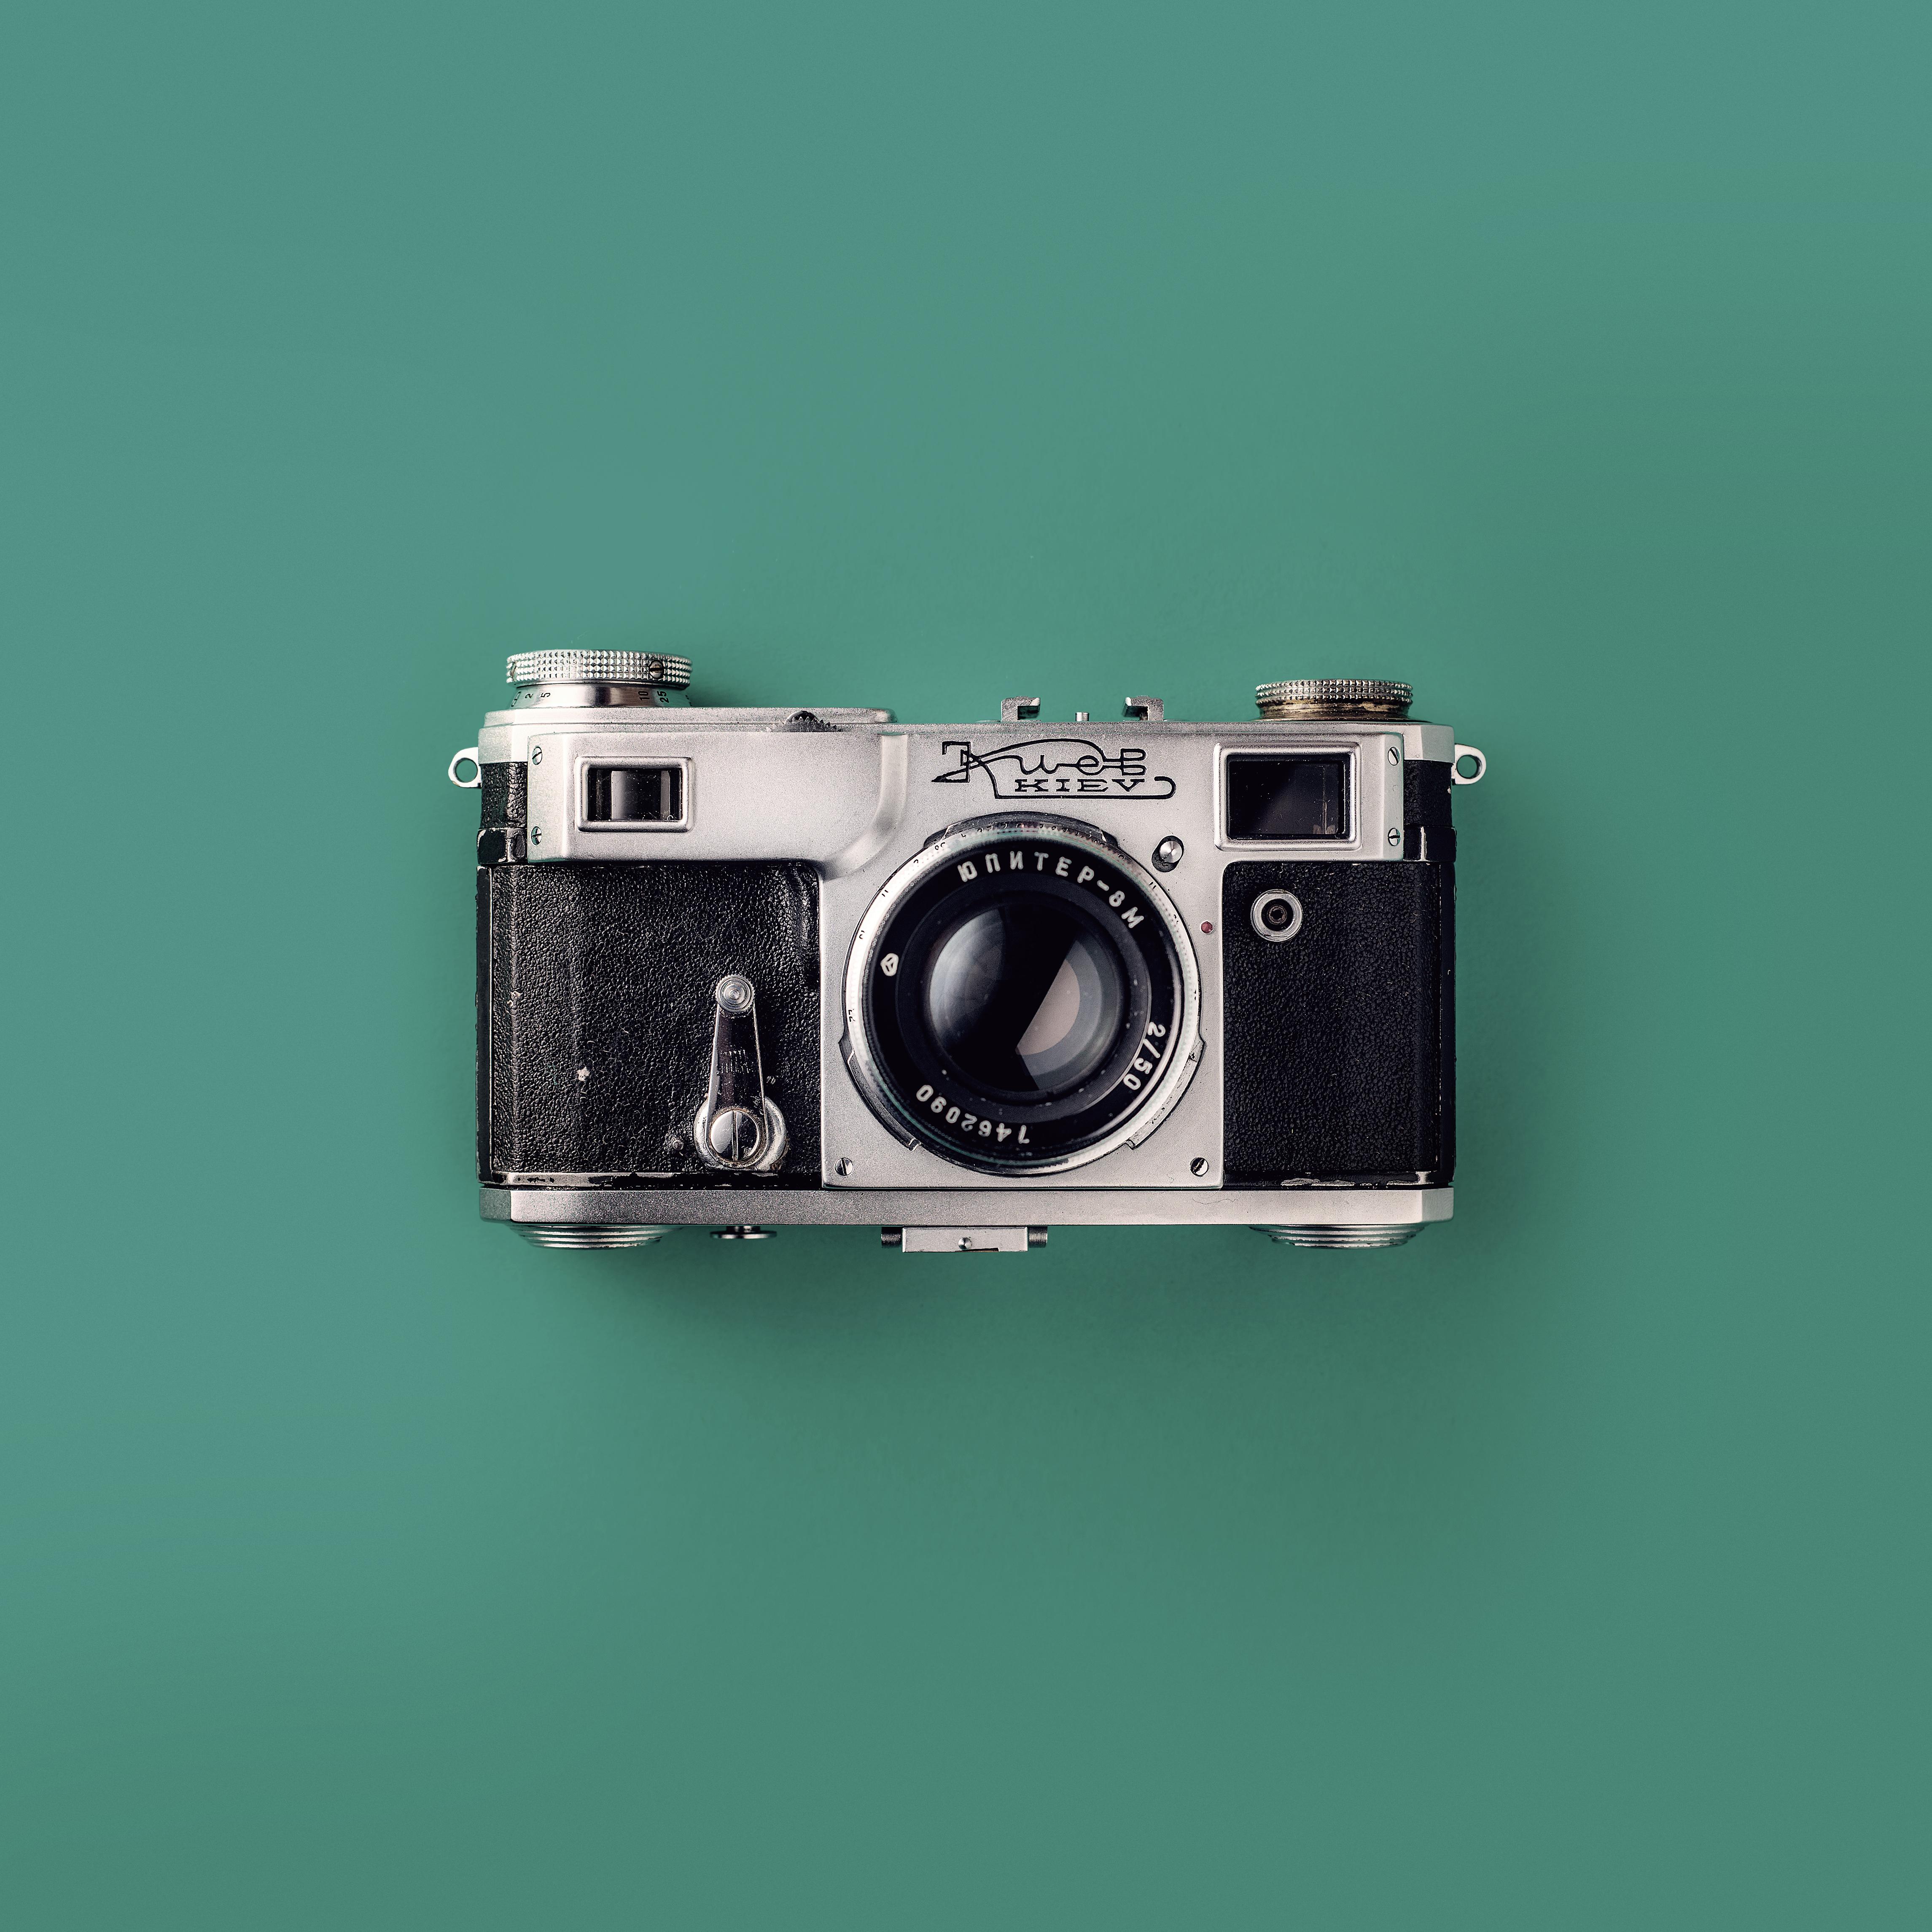 pexels-photo-1983037.jpeg